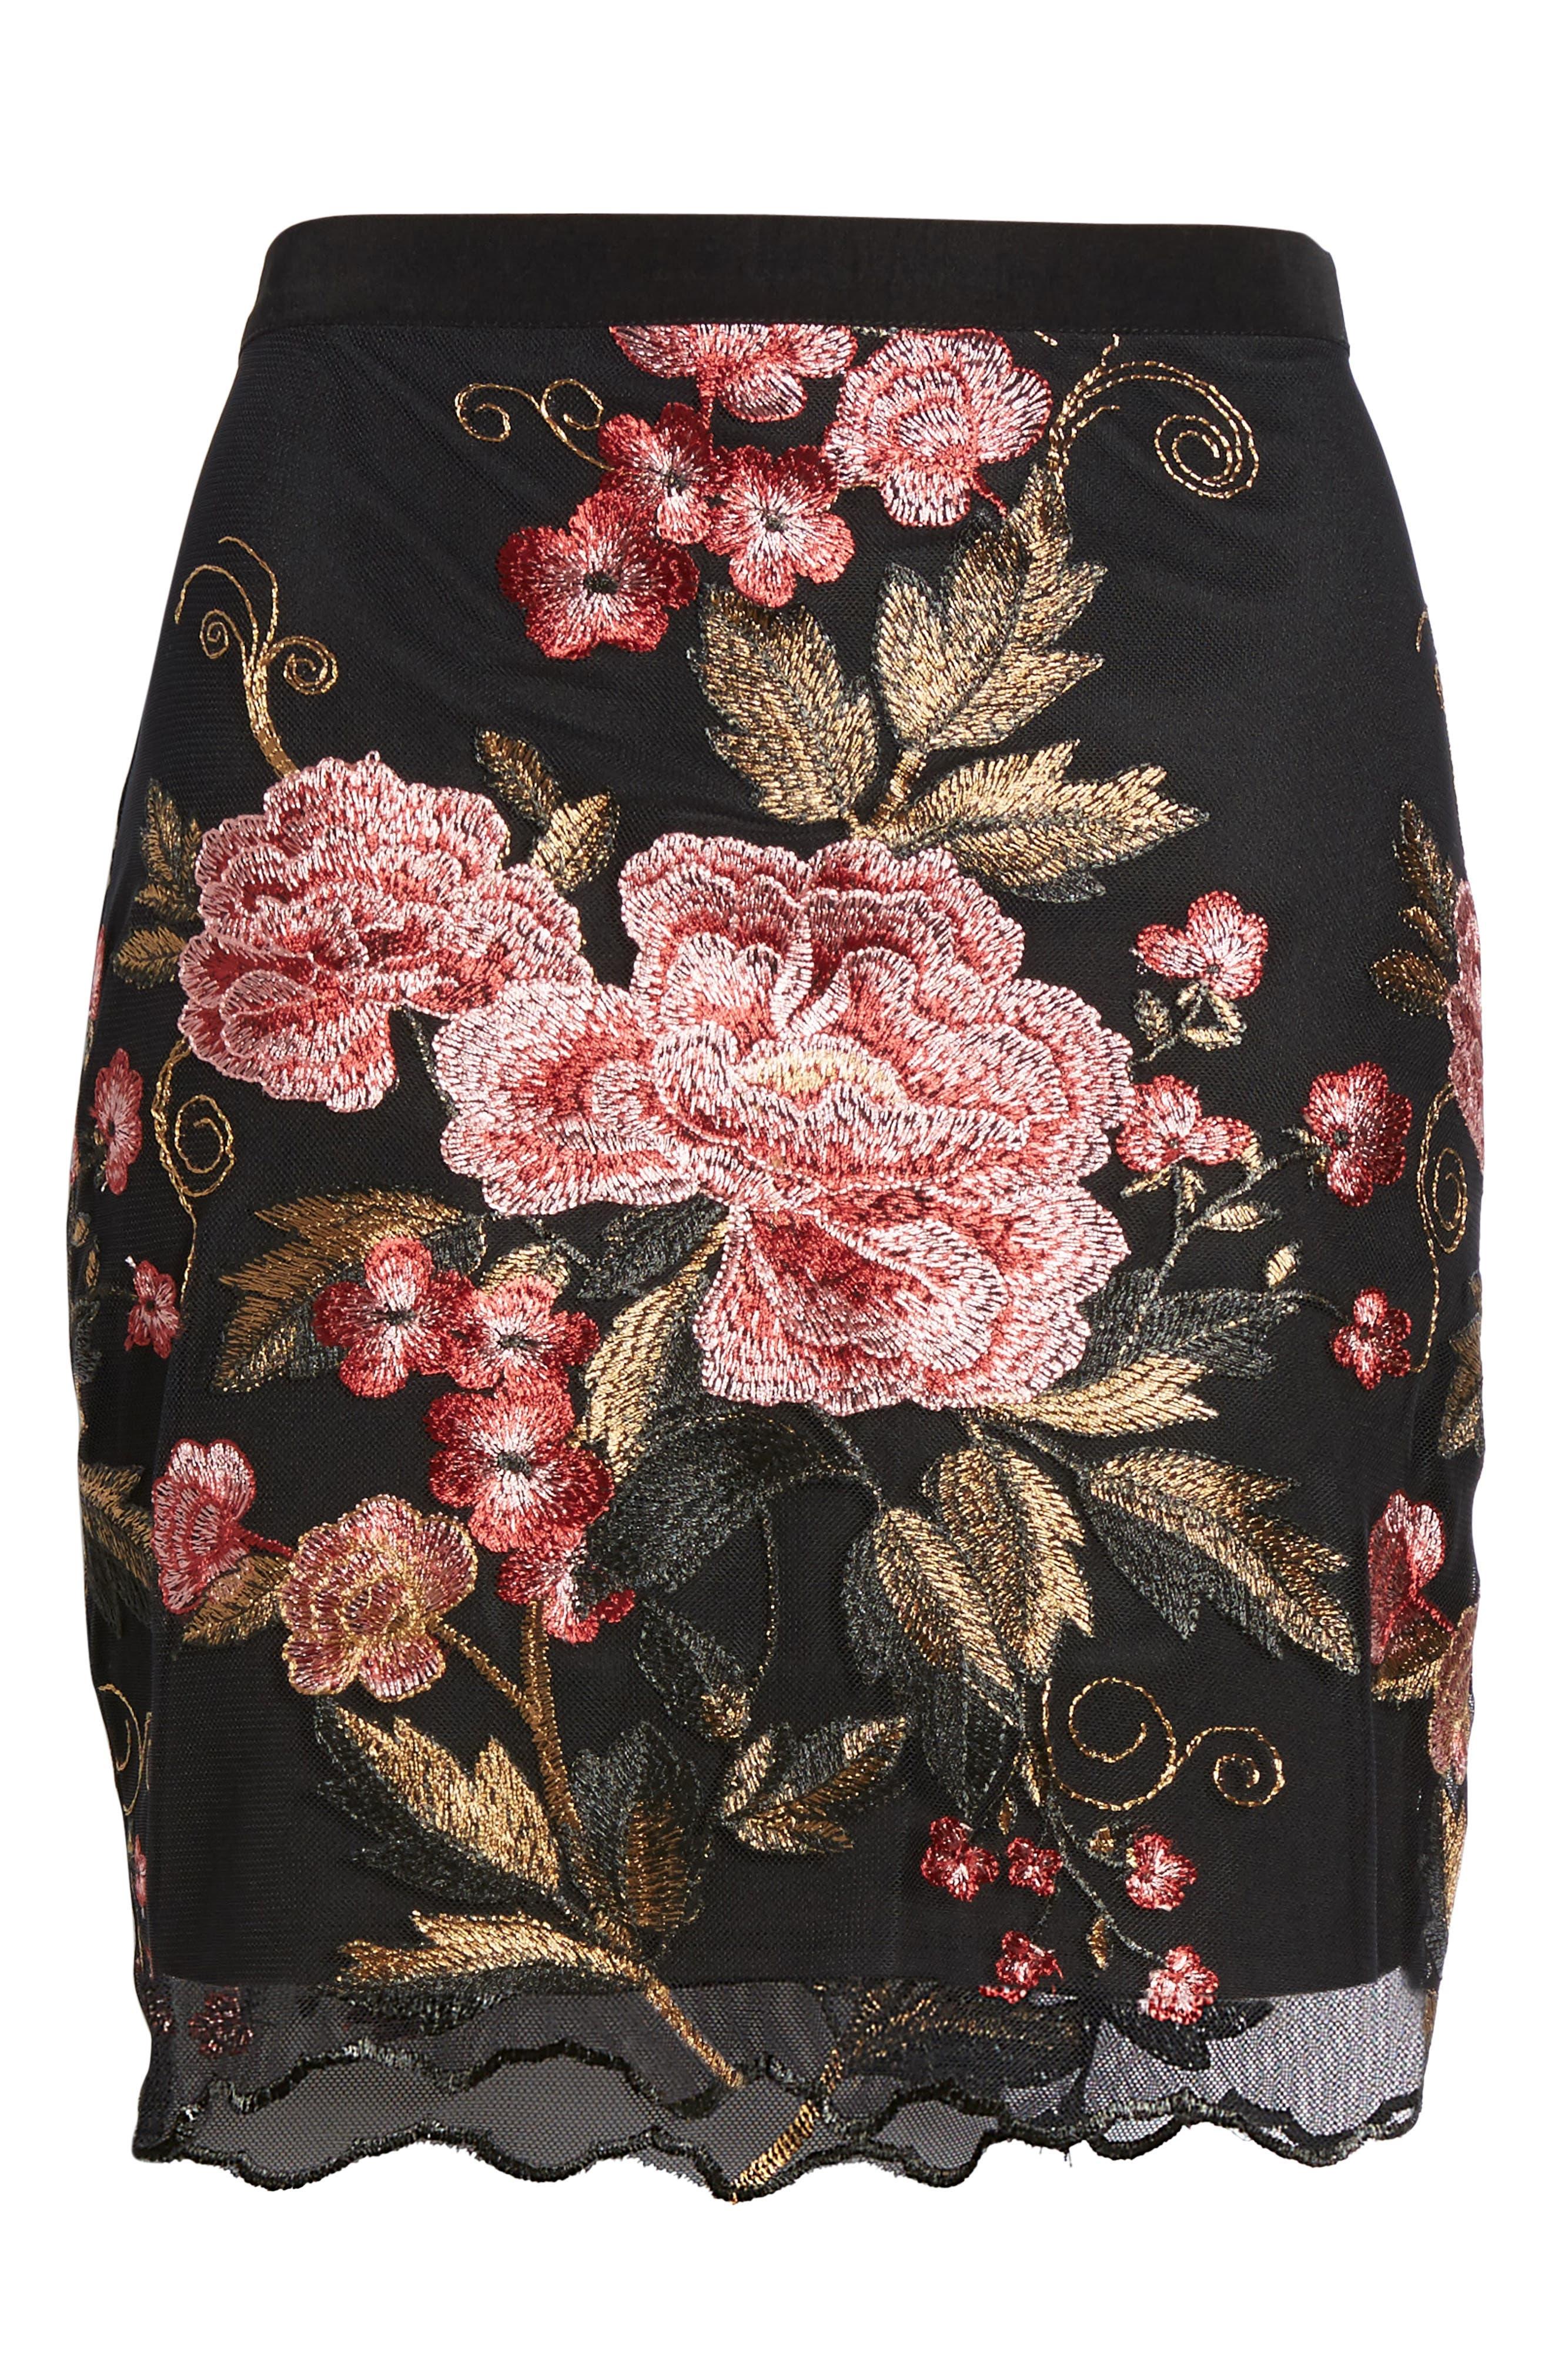 Sunset Embroidered Skirt,                             Alternate thumbnail 6, color,                             008